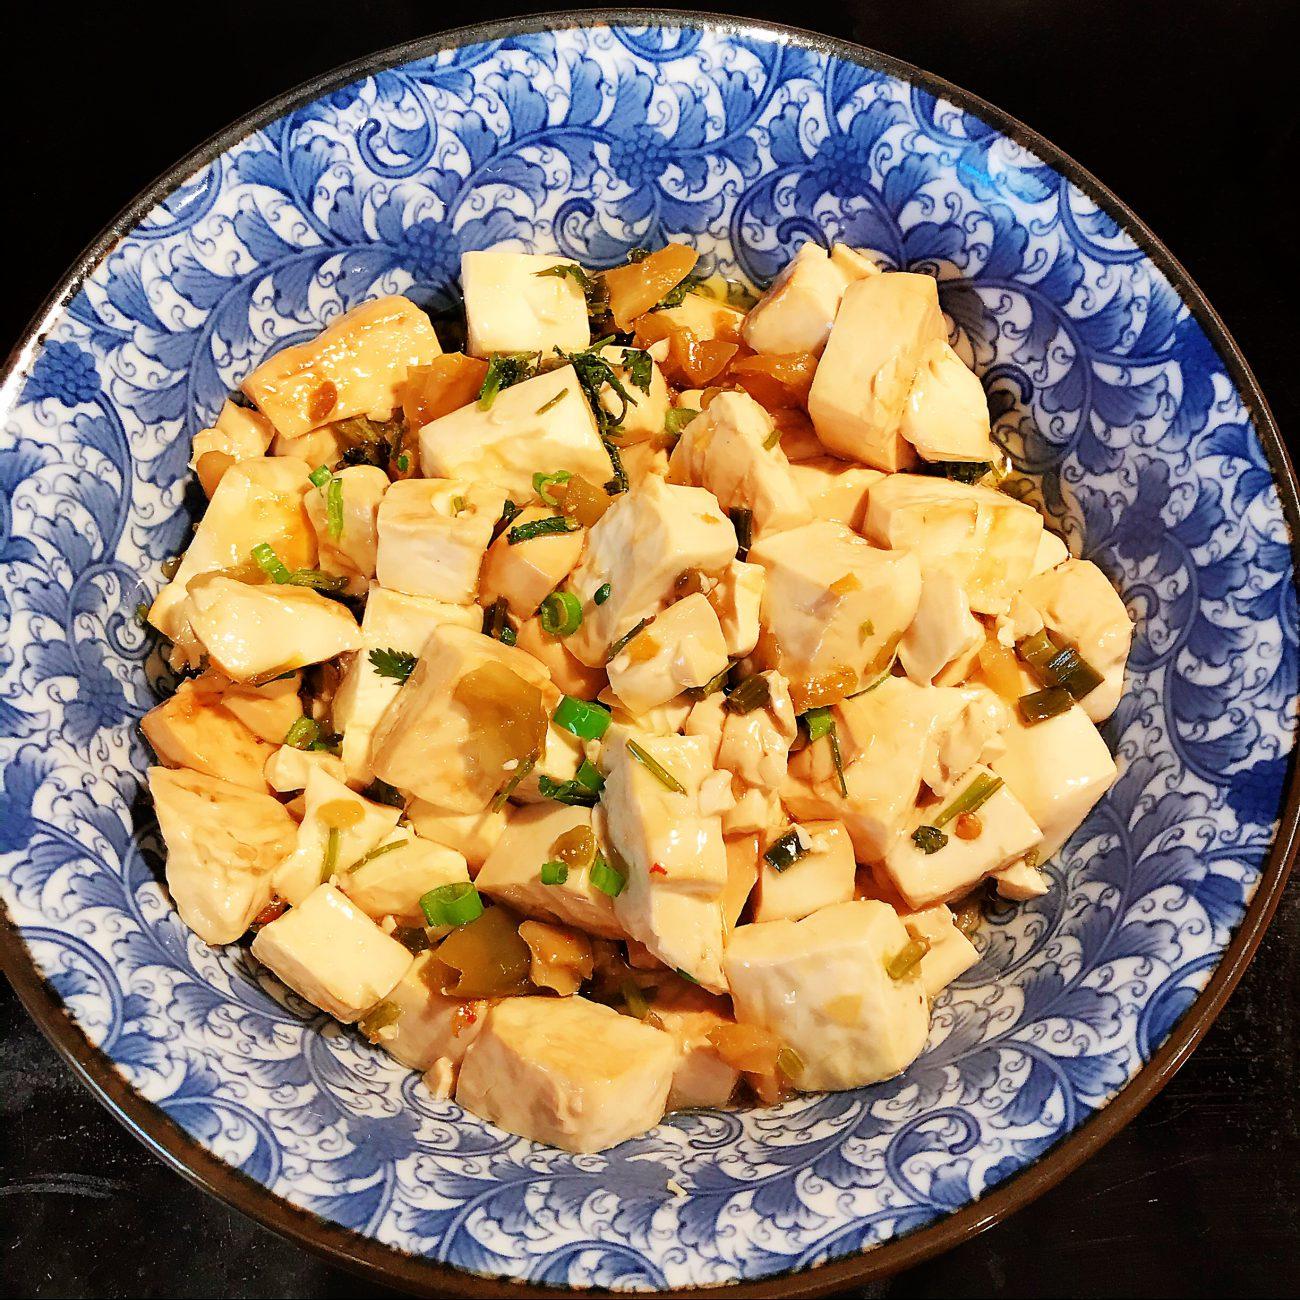 Cilantro grilled soft tofu